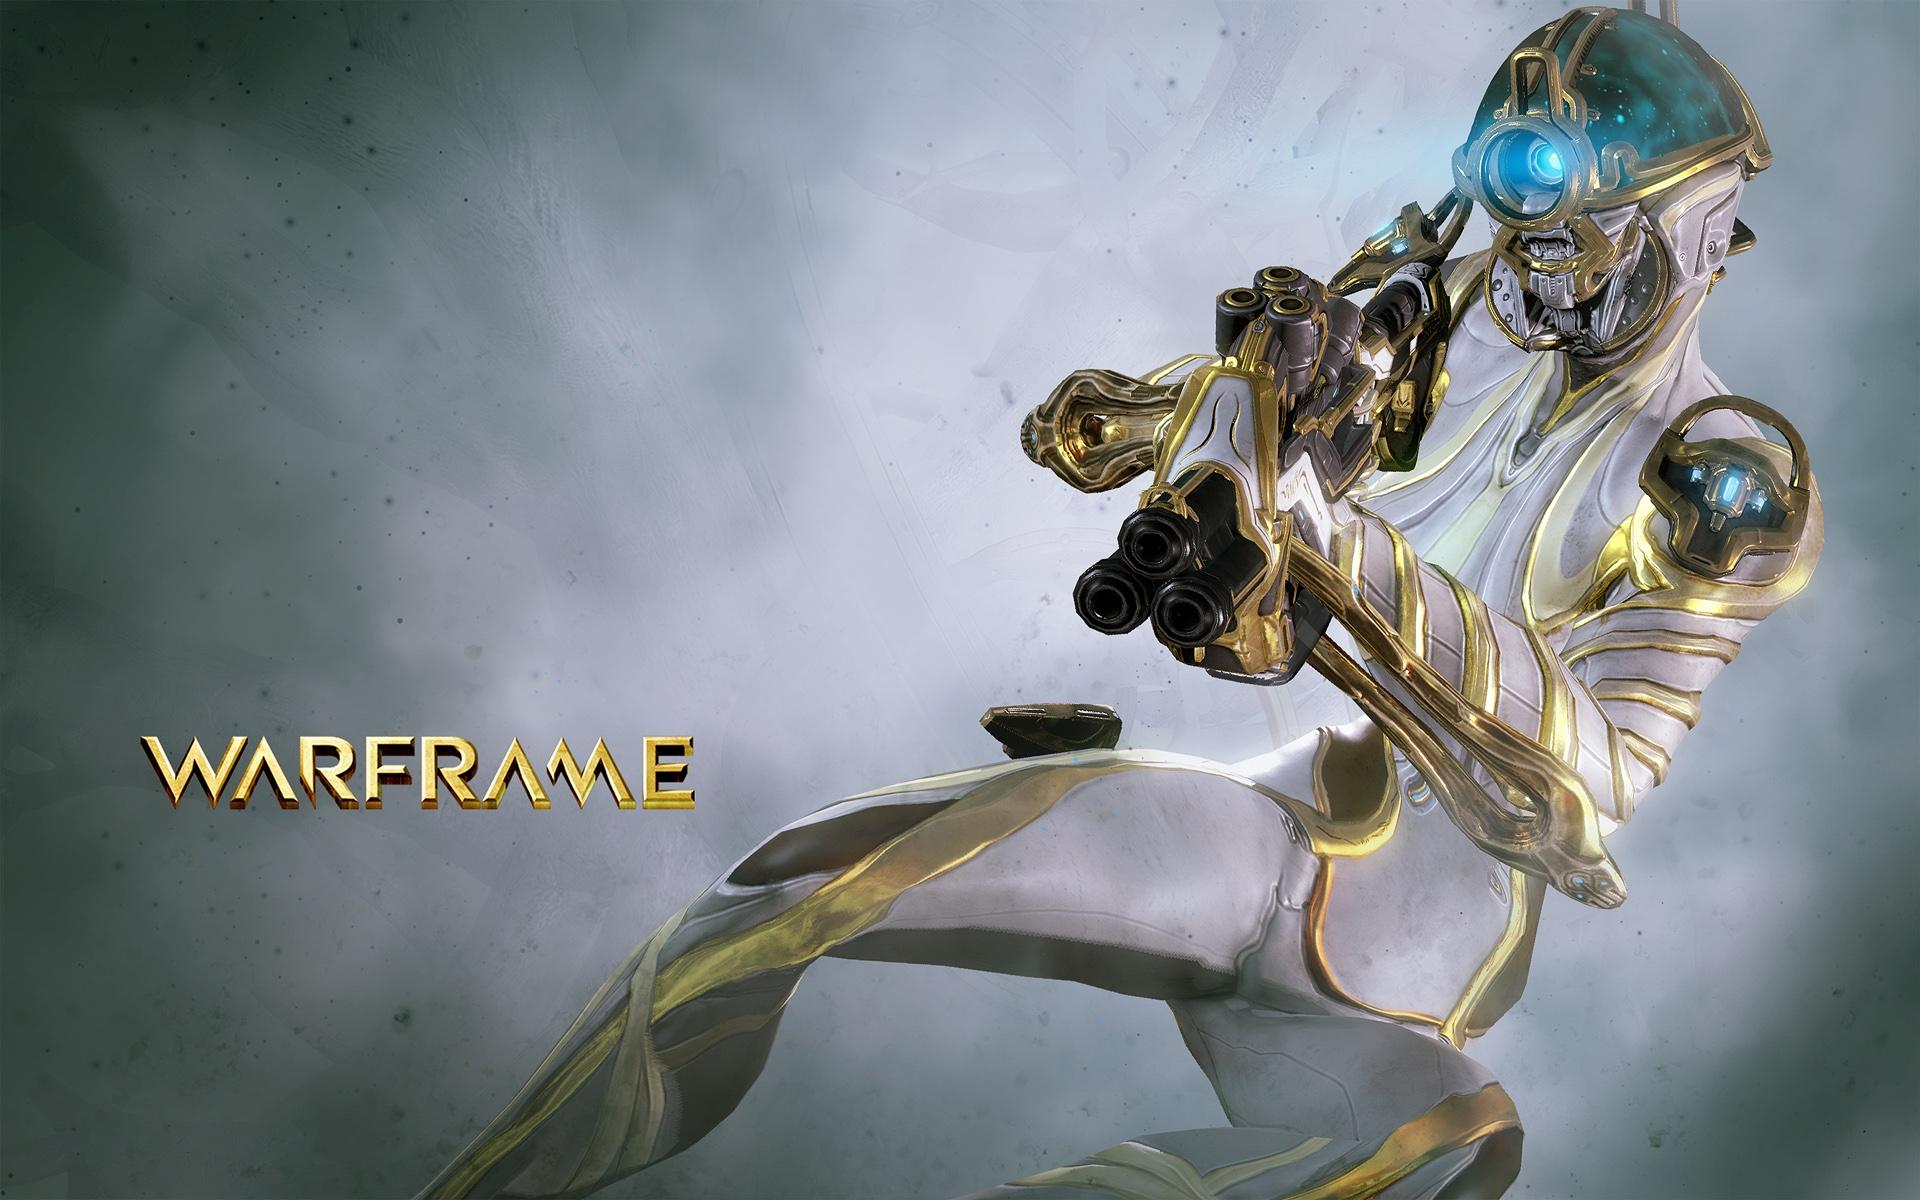 Mag/Prime - WARFRAME Wiki: warframe.wikia.com/wiki/Mag/Prime